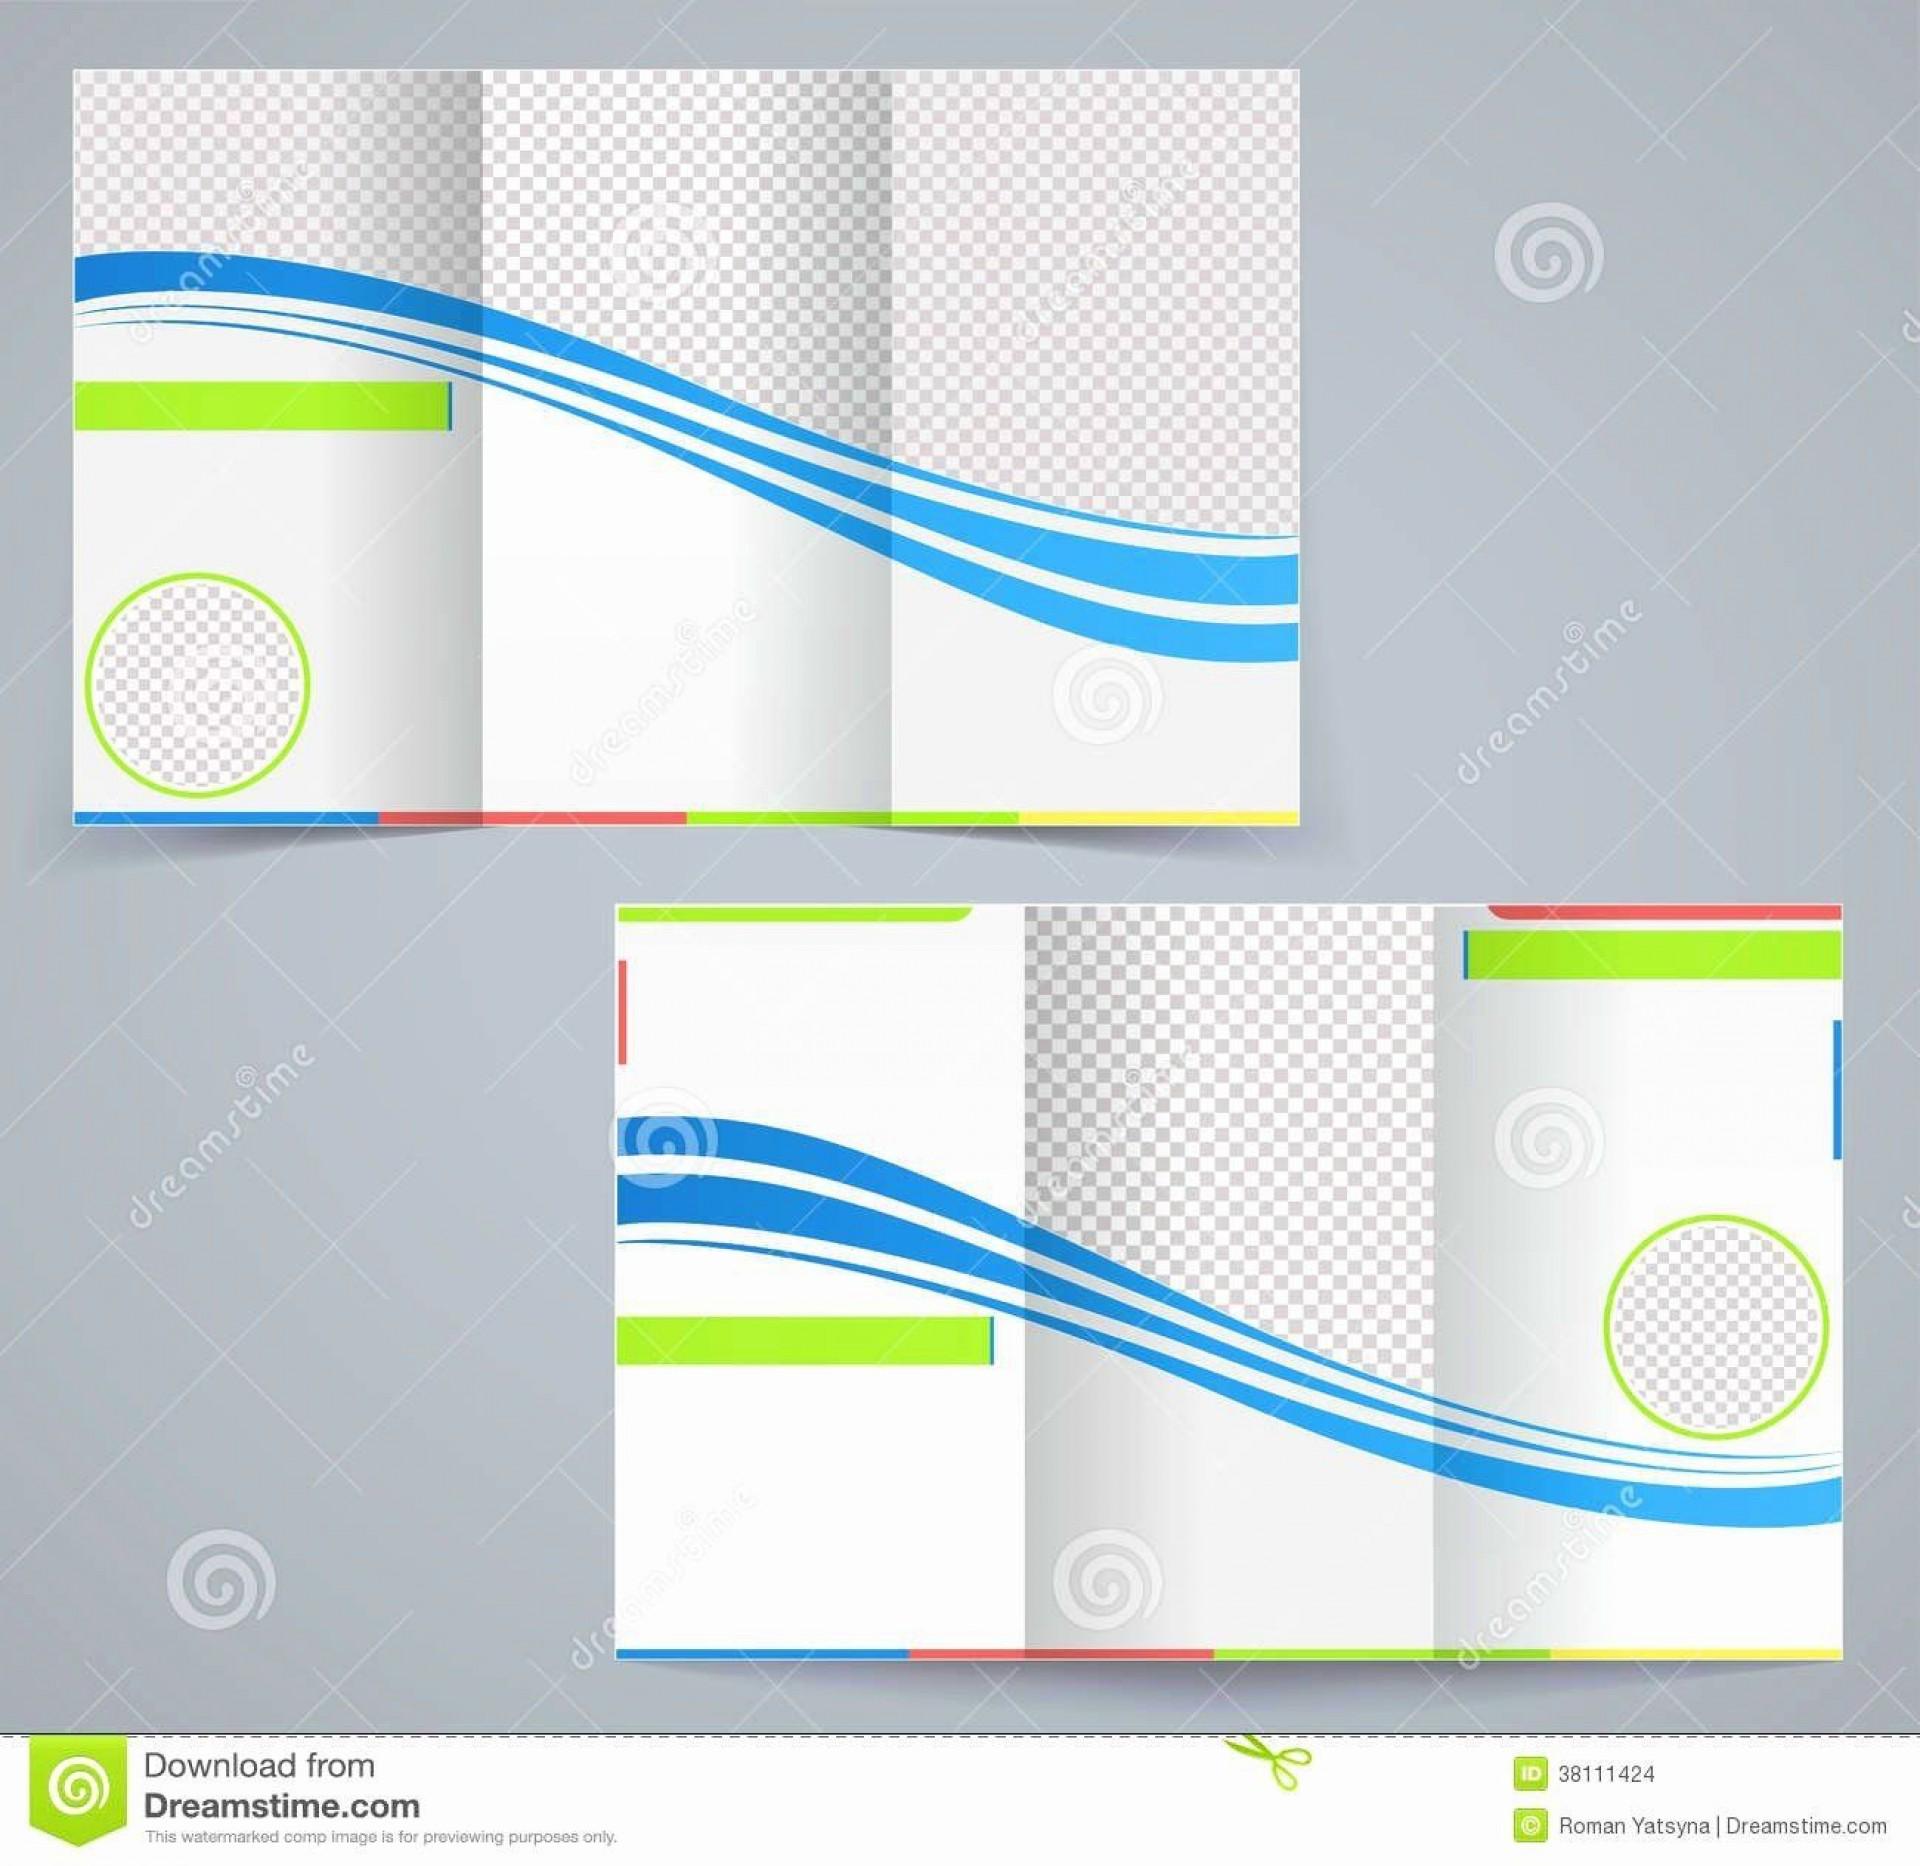 000 Stirring Tri Fold Brochure Template Word Design  2010 2007 Free1920